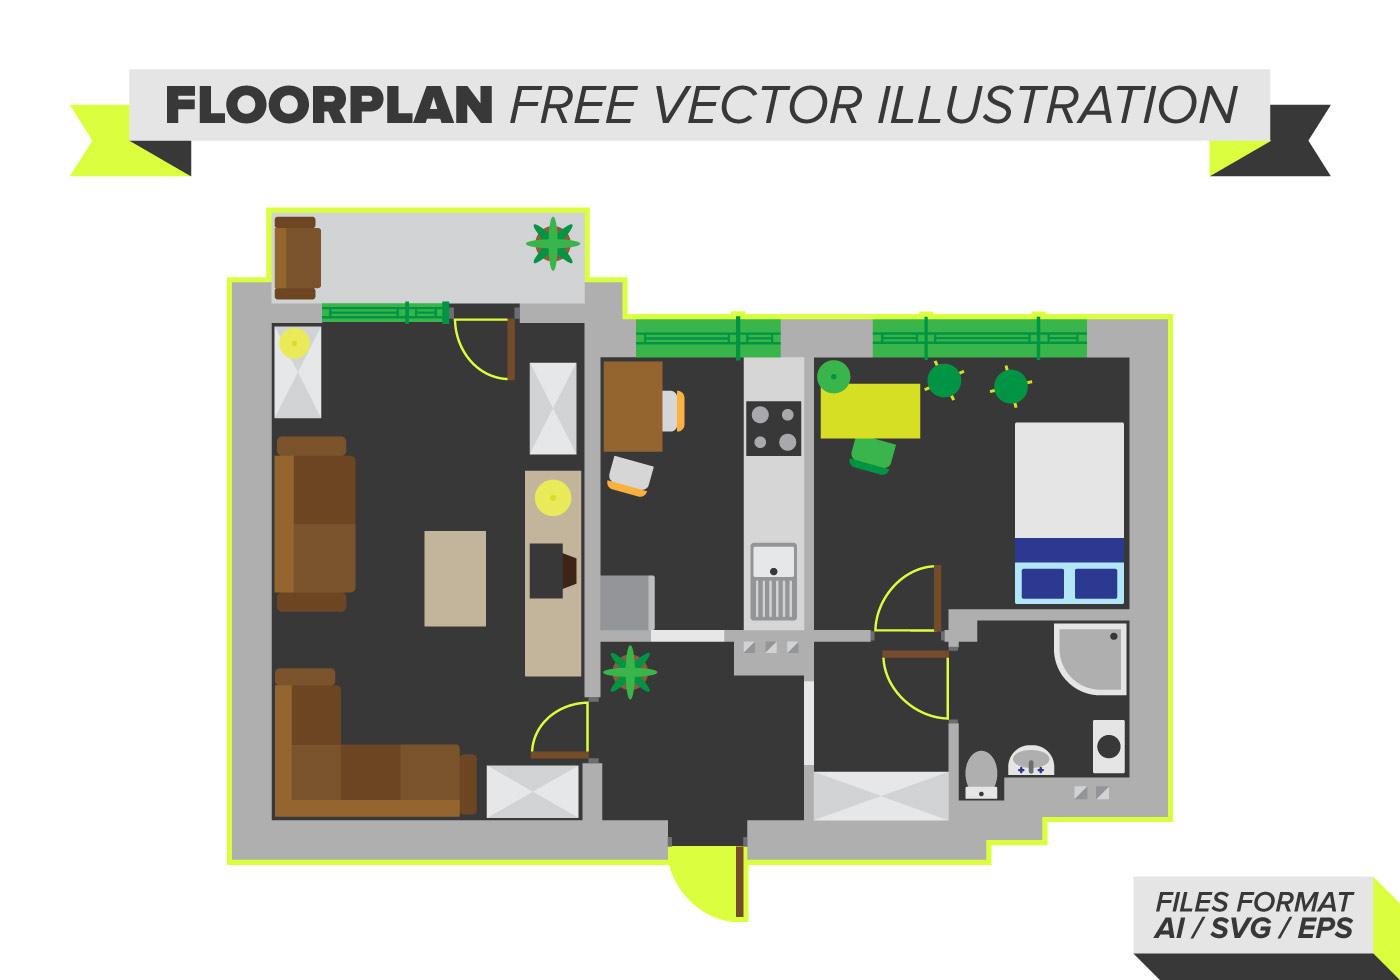 Floorplan Free Vector Illustration - Download Free Vectors ...